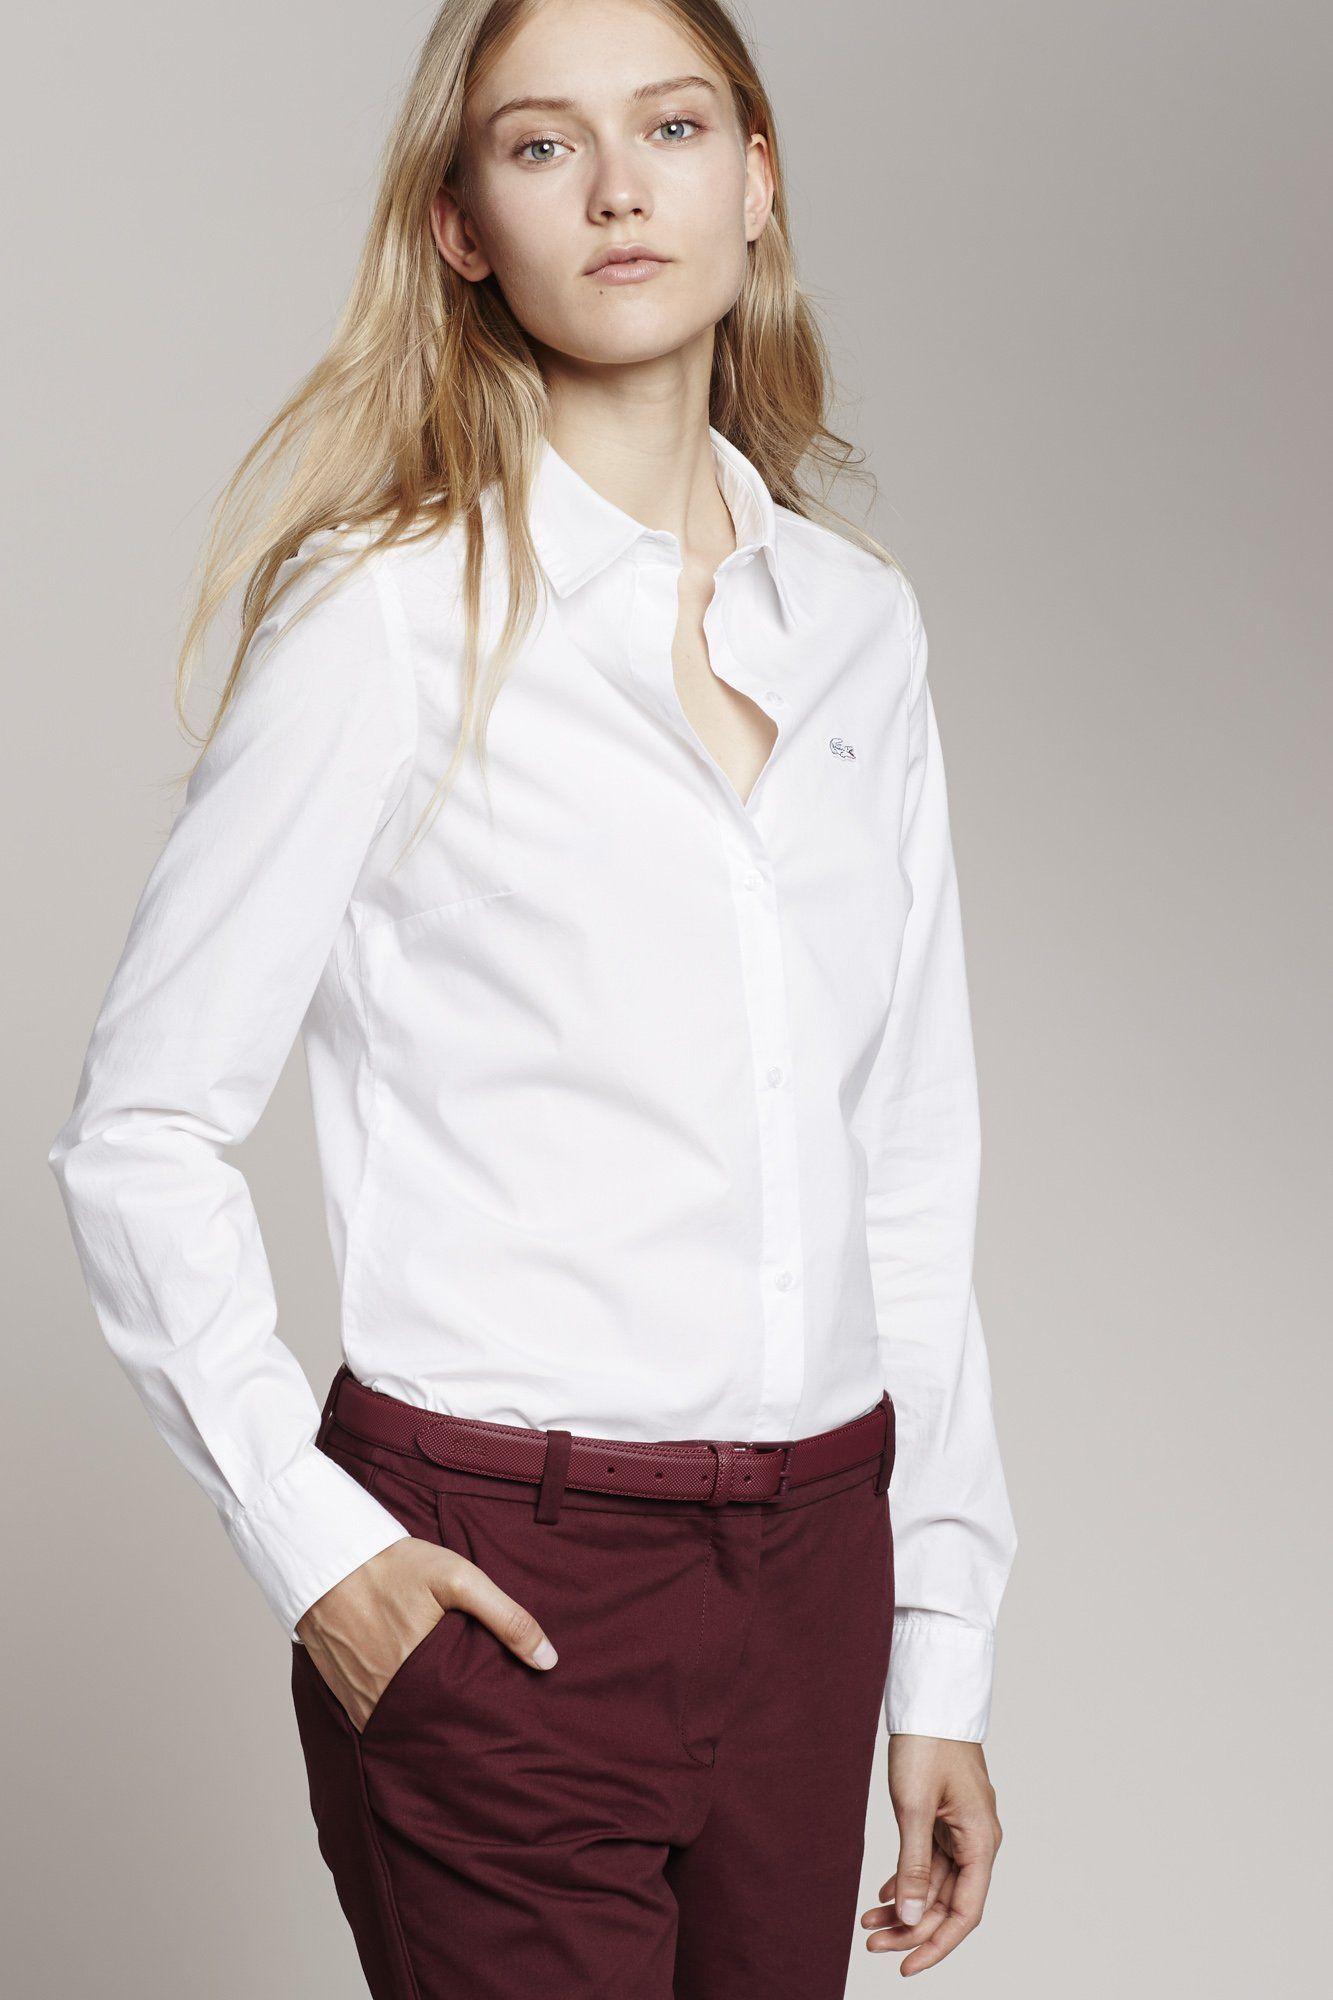 caa732c62d Lacoste Long Sleeve Stretch Cotton Poplin Shirt : Women | women ...